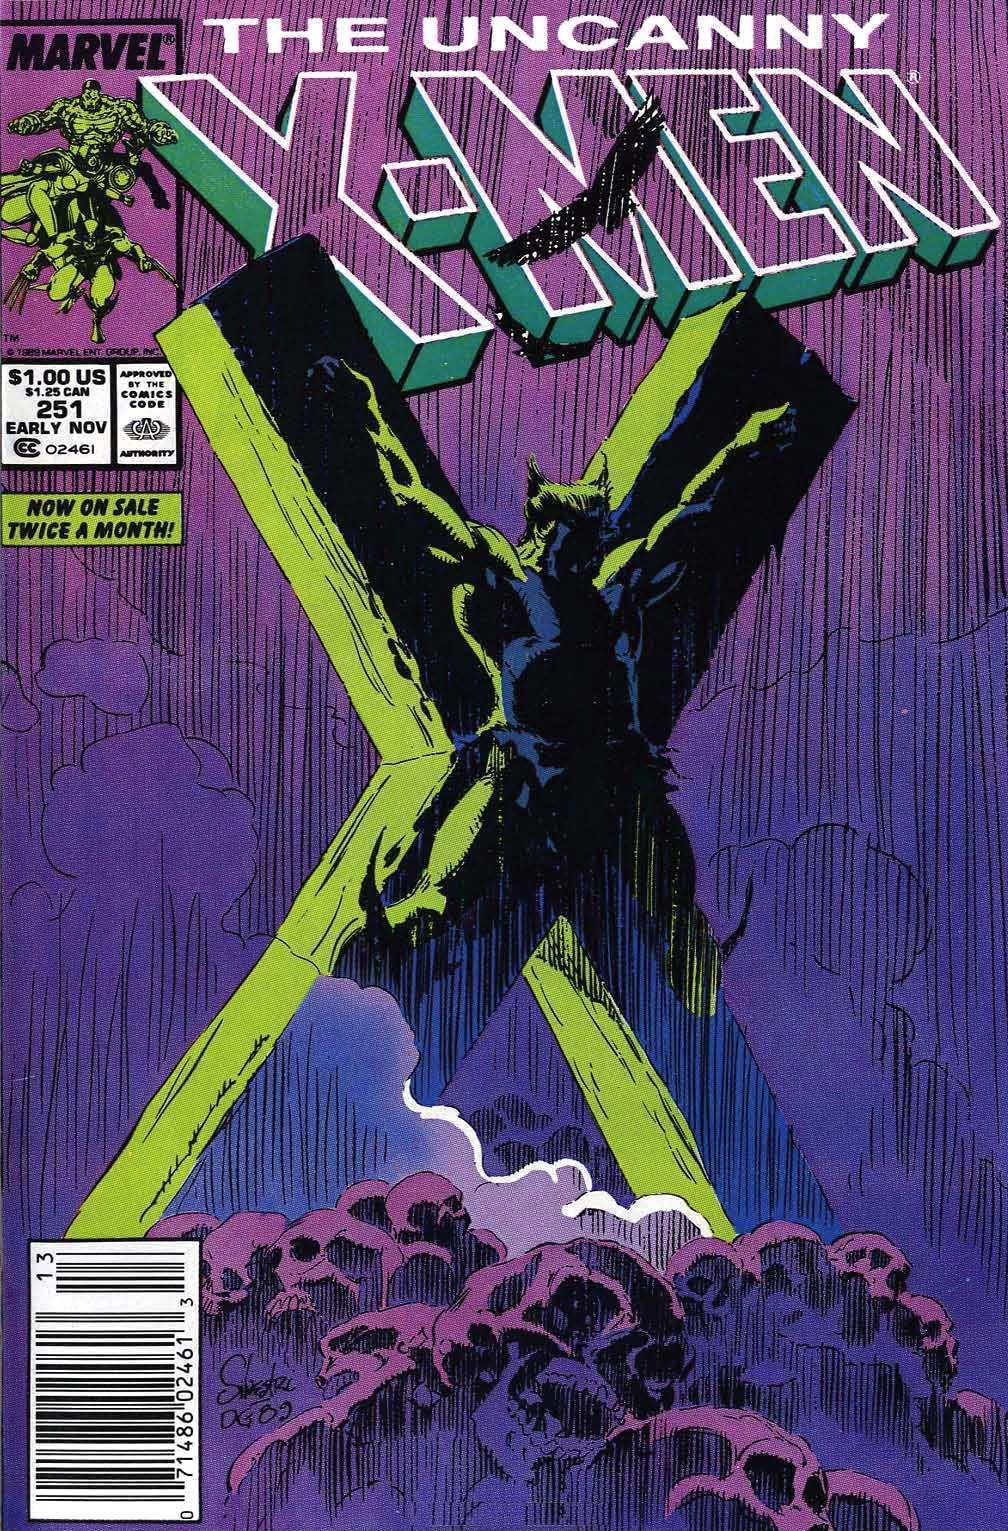 Uncanny x men vol 1 251 comic marvel and comic covers uncanny x men 251 by marc silvestri fandeluxe Gallery